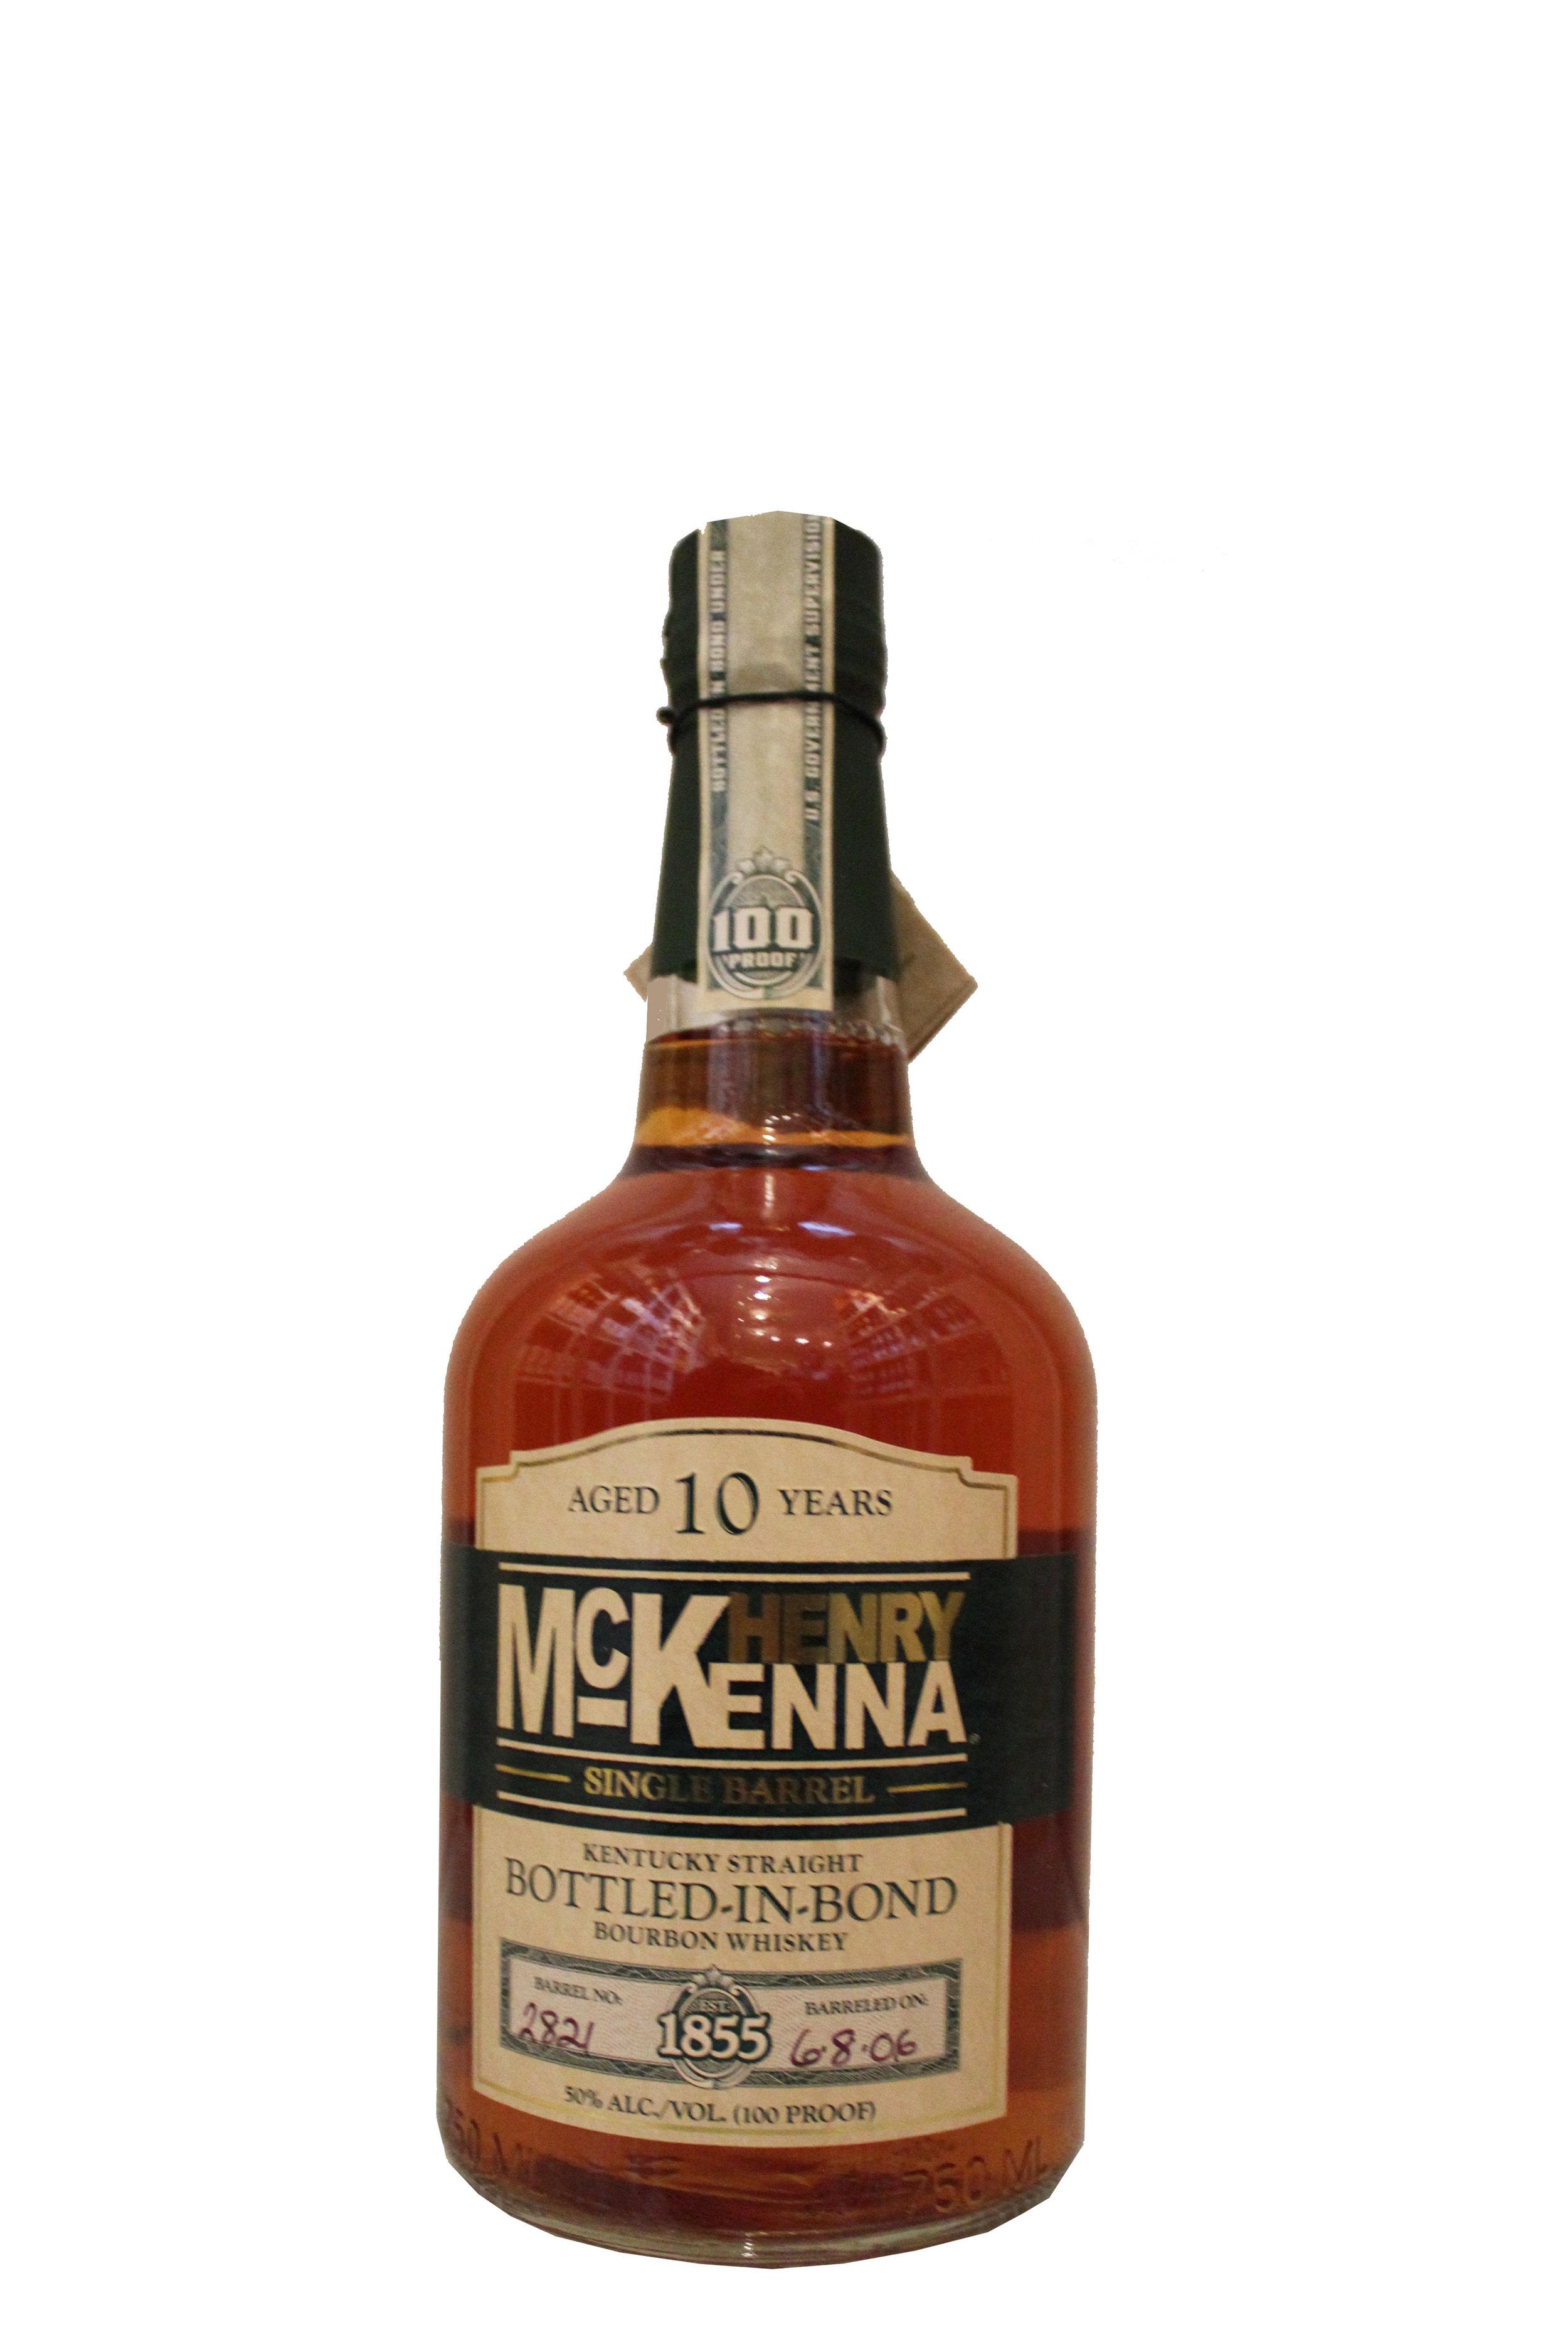 10-year Bourbon Whiskey,  Henry   Mckenna, Kentucky